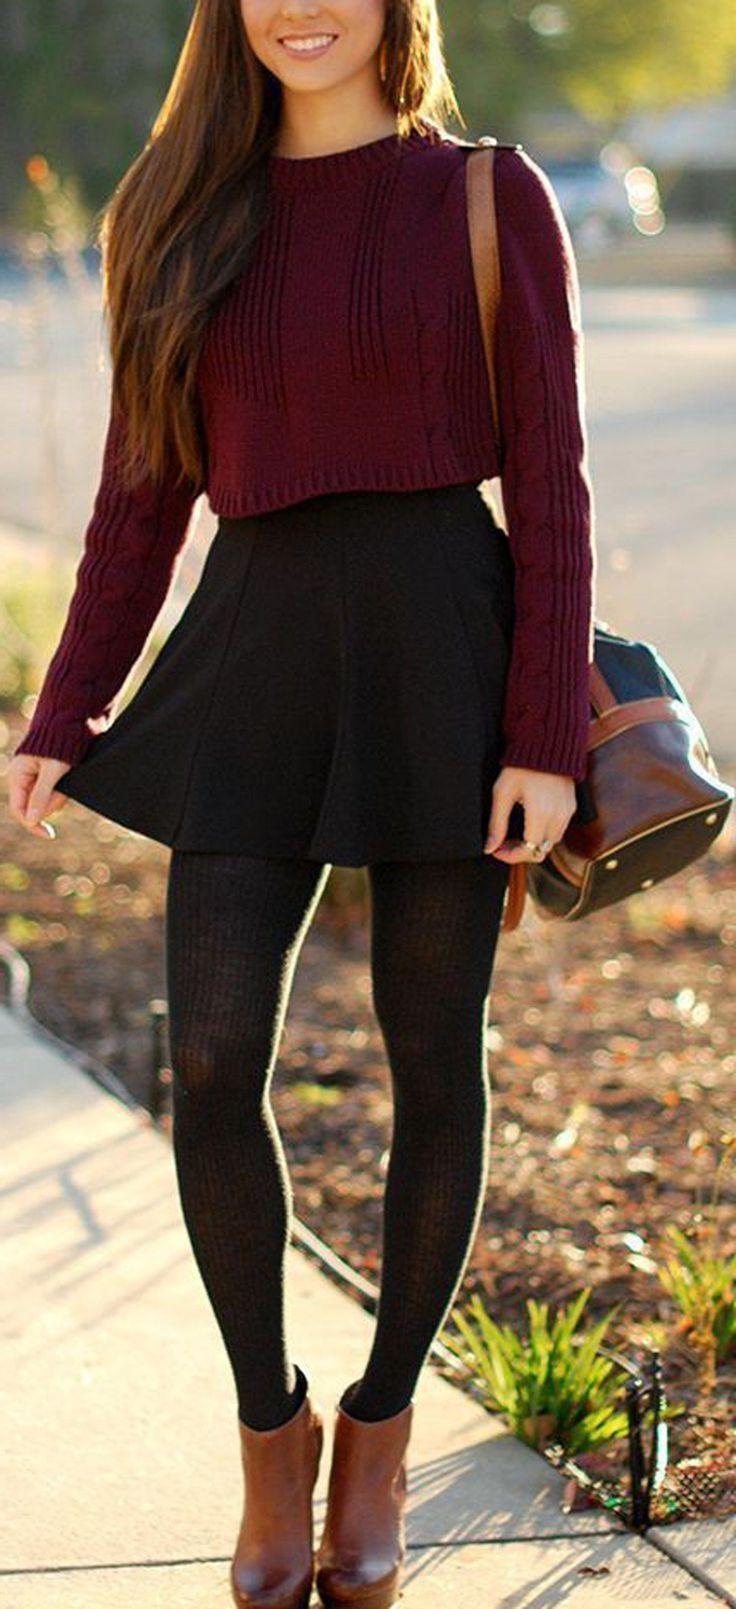 Classy Winter Outfit Ideas for Teens for Teen Girls Crop Top Skater Skirt St